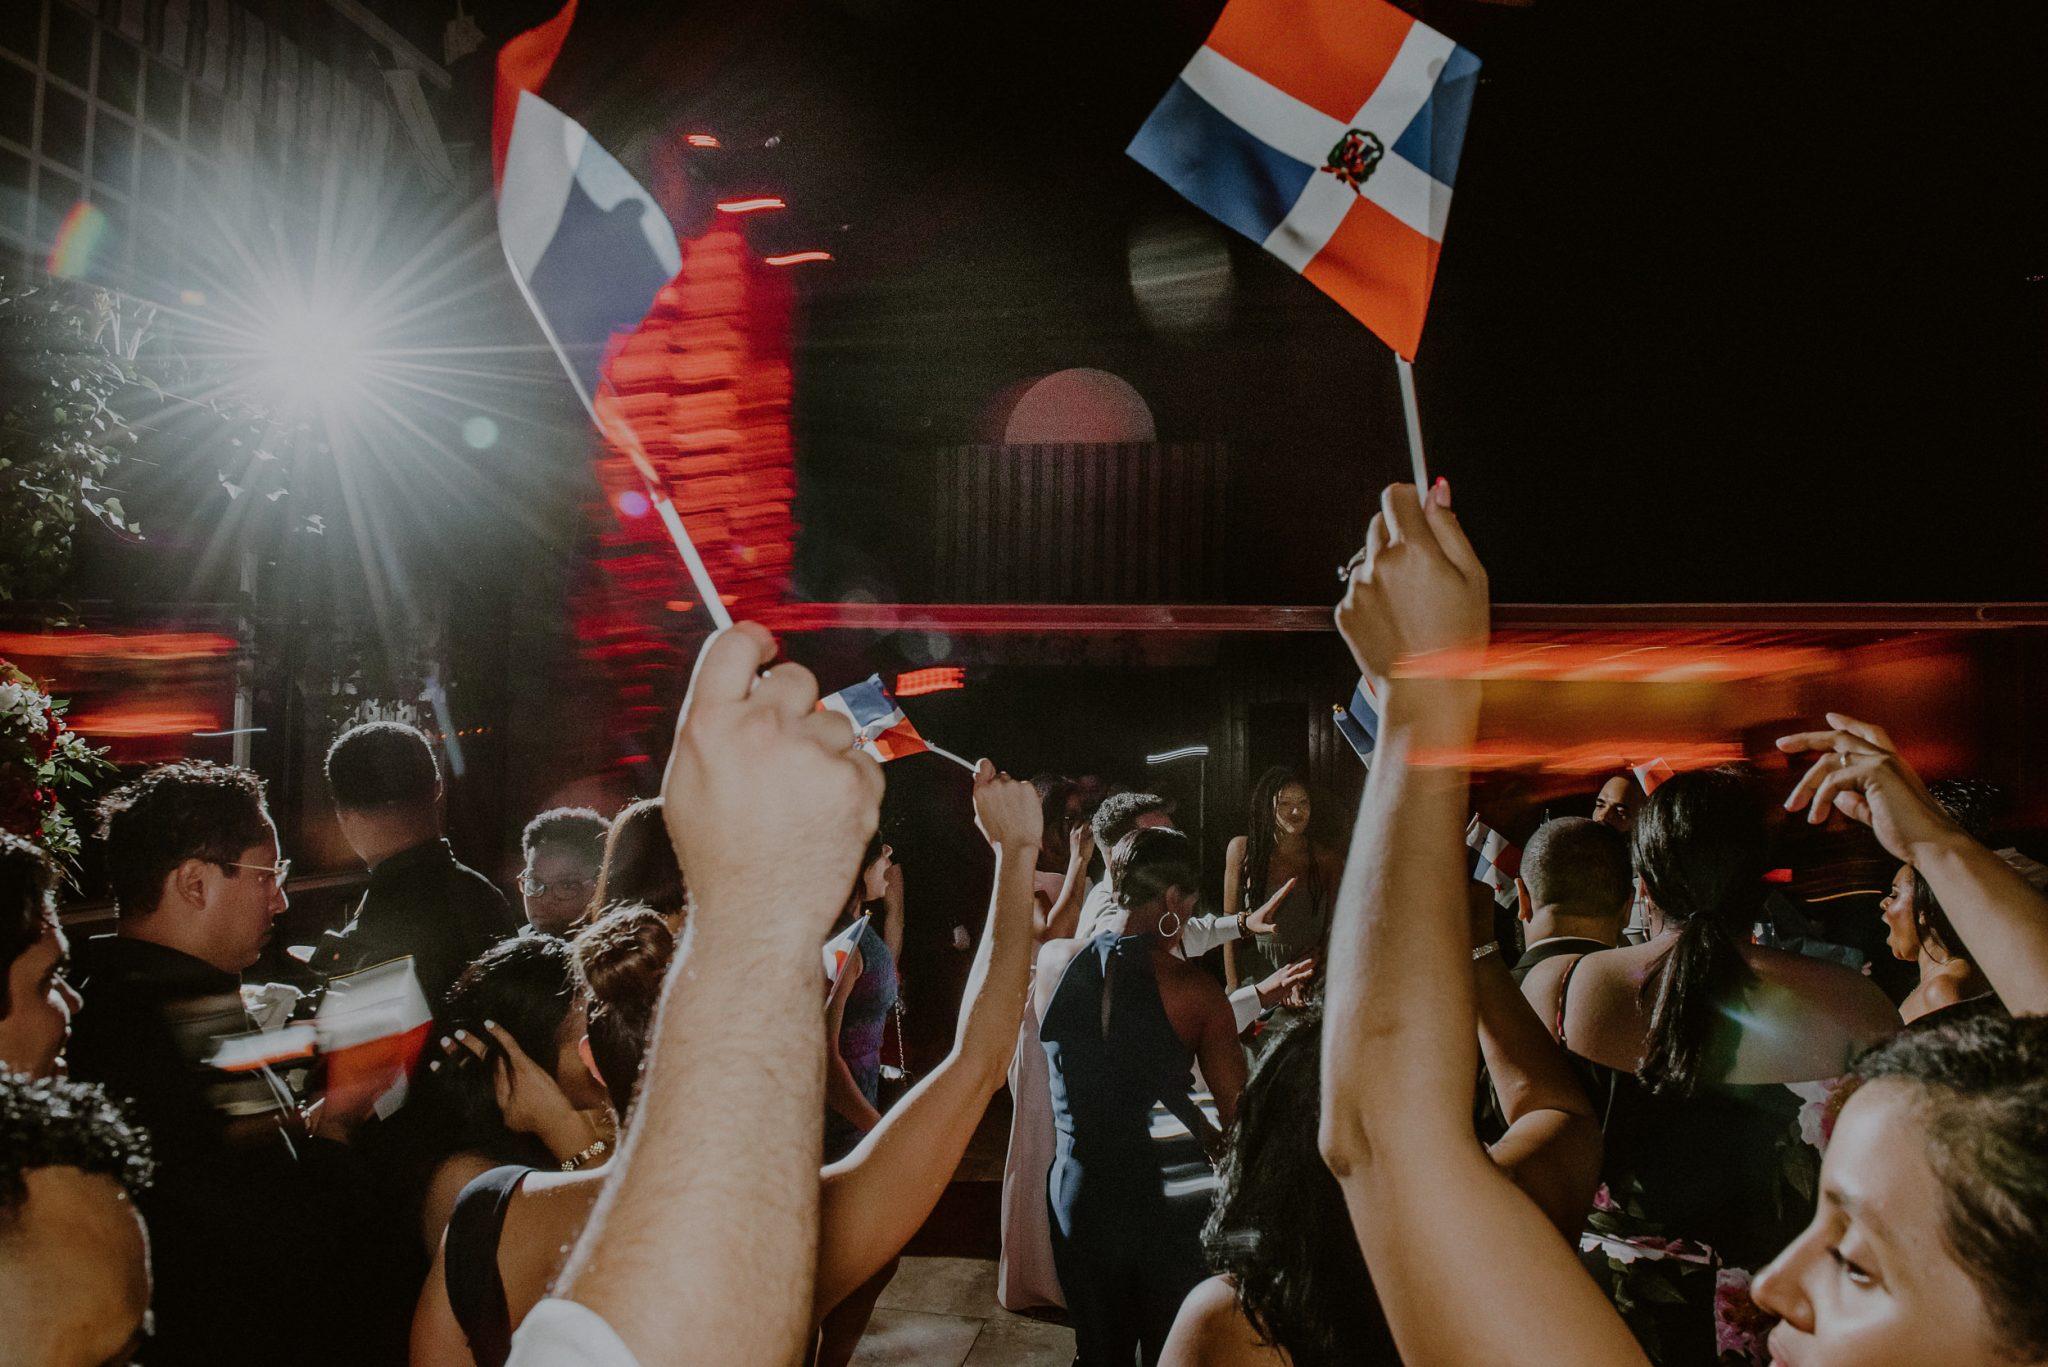 salvadorian wedding flags on dance floor at long island wedding venue fox hollow